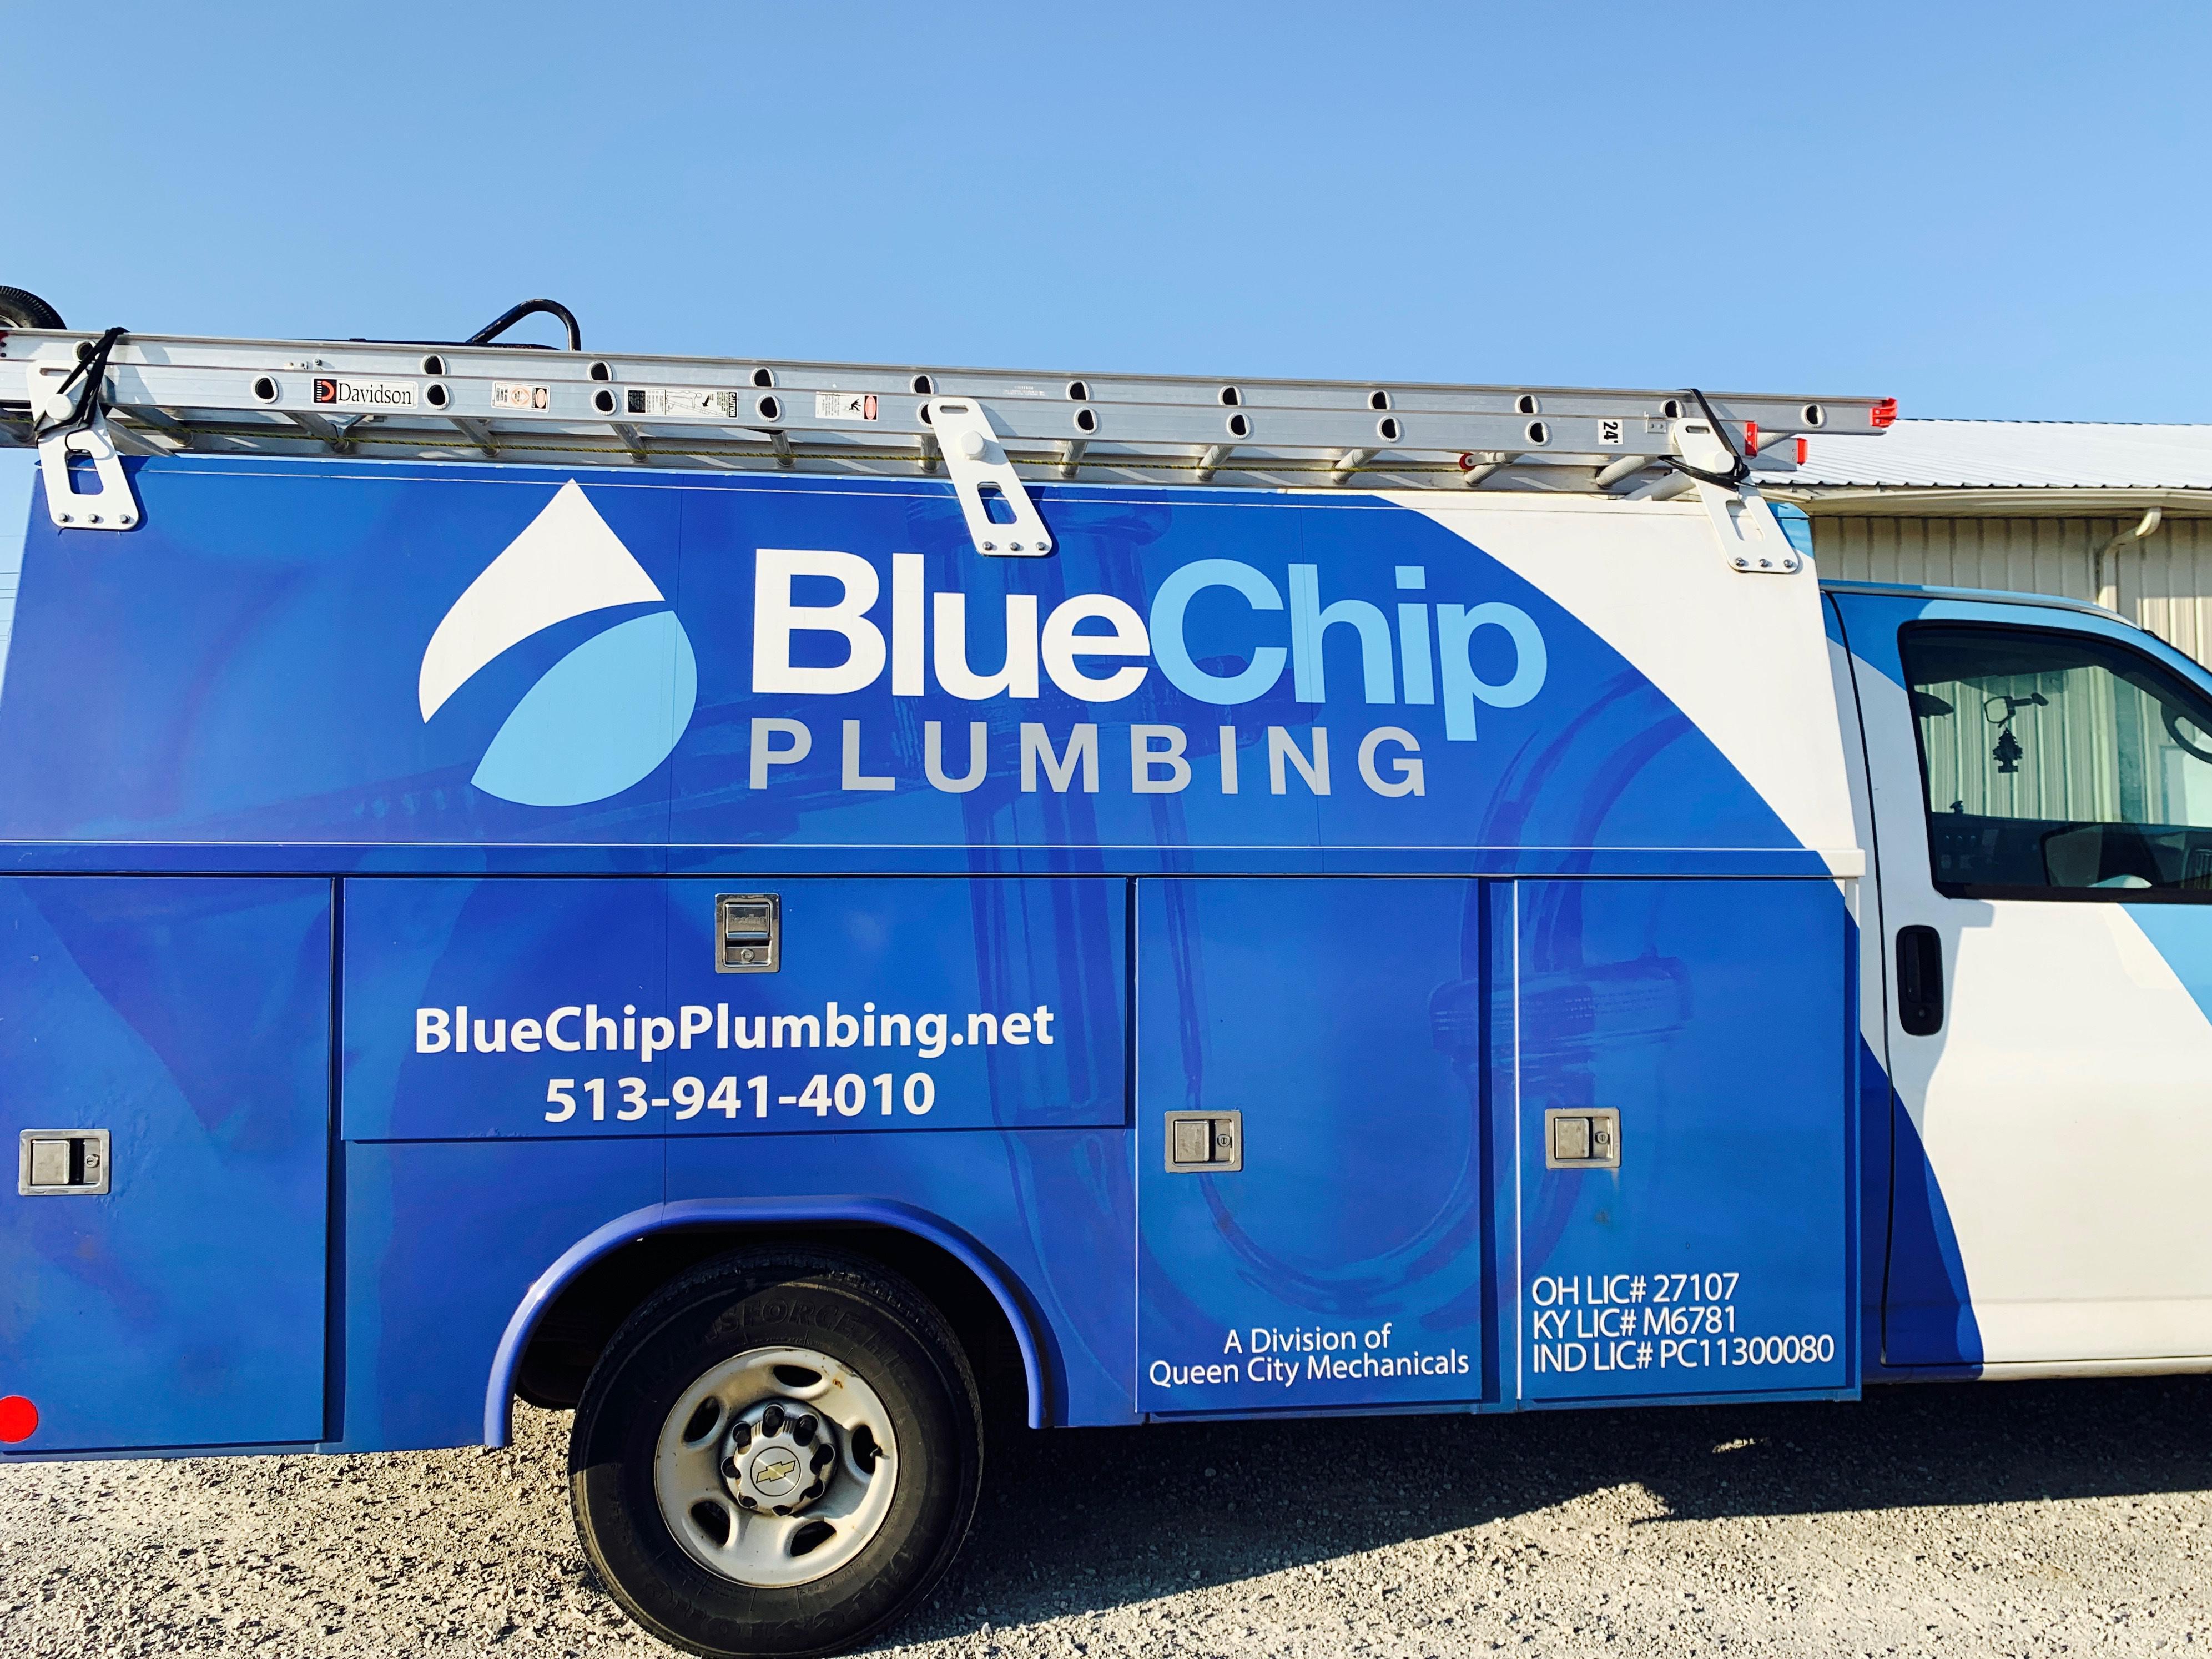 Blue Chip Plumbing